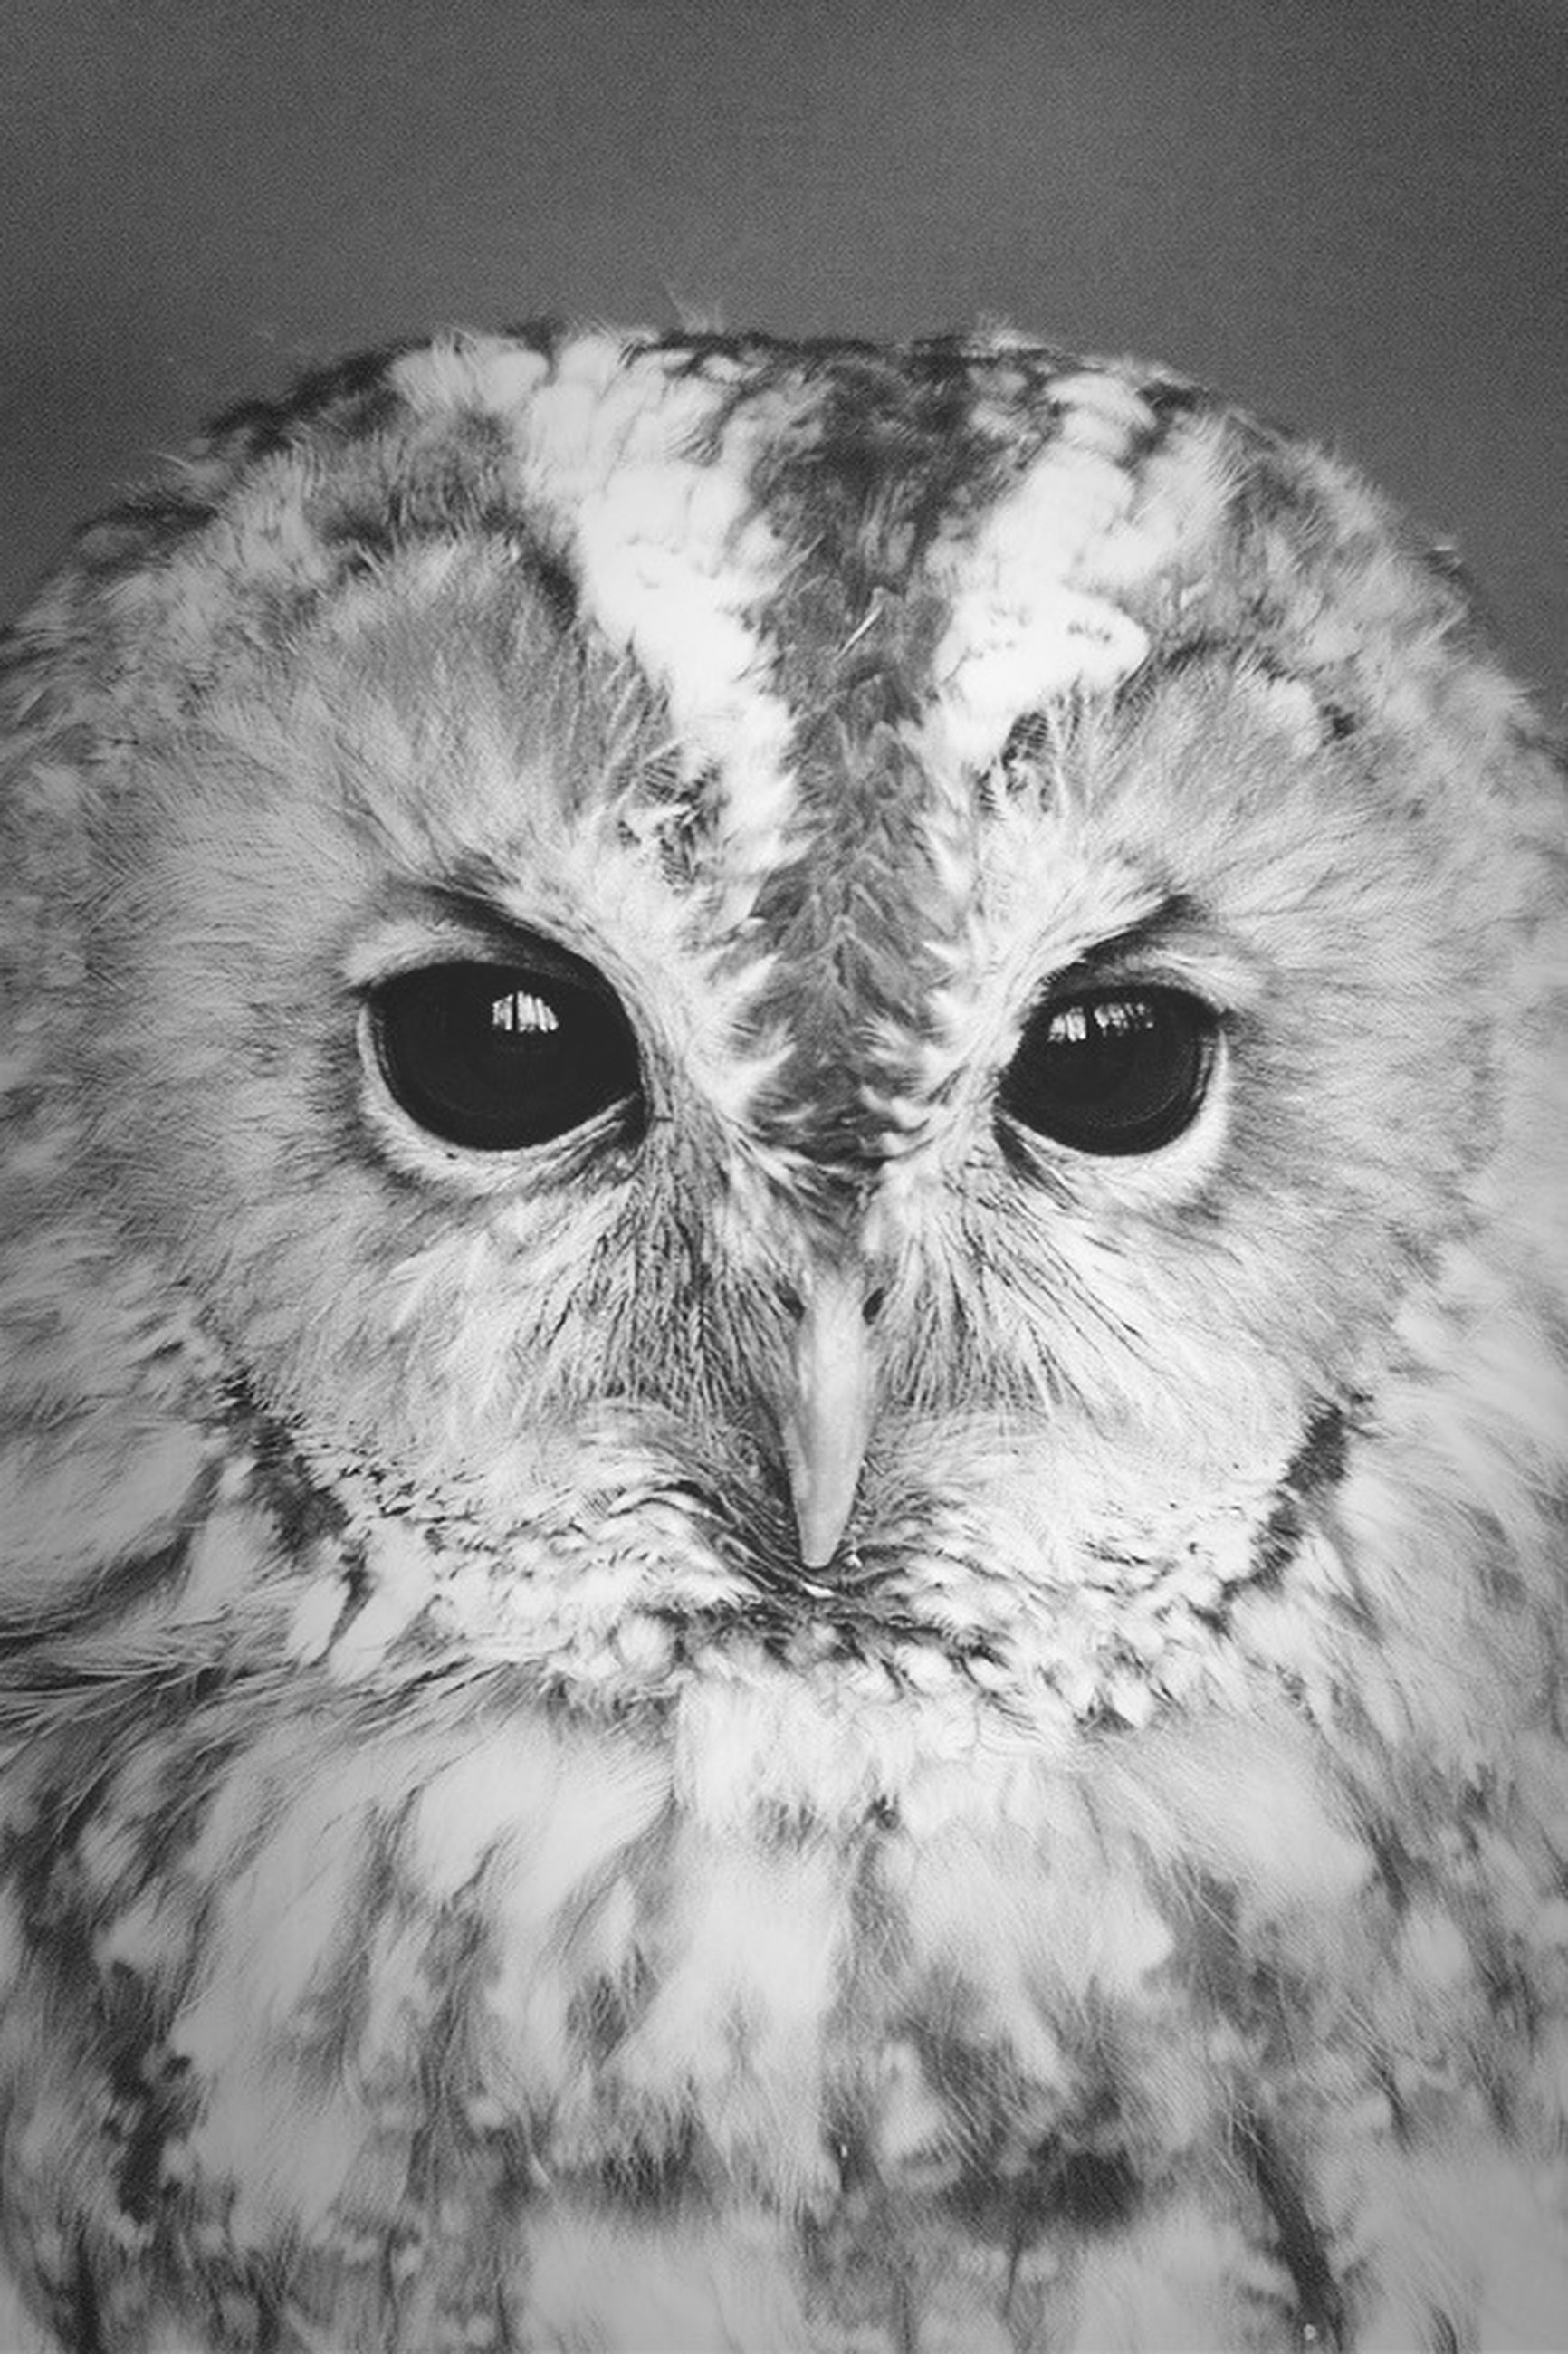 animal themes, one animal, portrait, animal head, close-up, bird, looking at camera, wildlife, animal eye, indoors, animal body part, pets, animals in the wild, animal hair, domestic animals, front view, bird of prey, beak, mammal